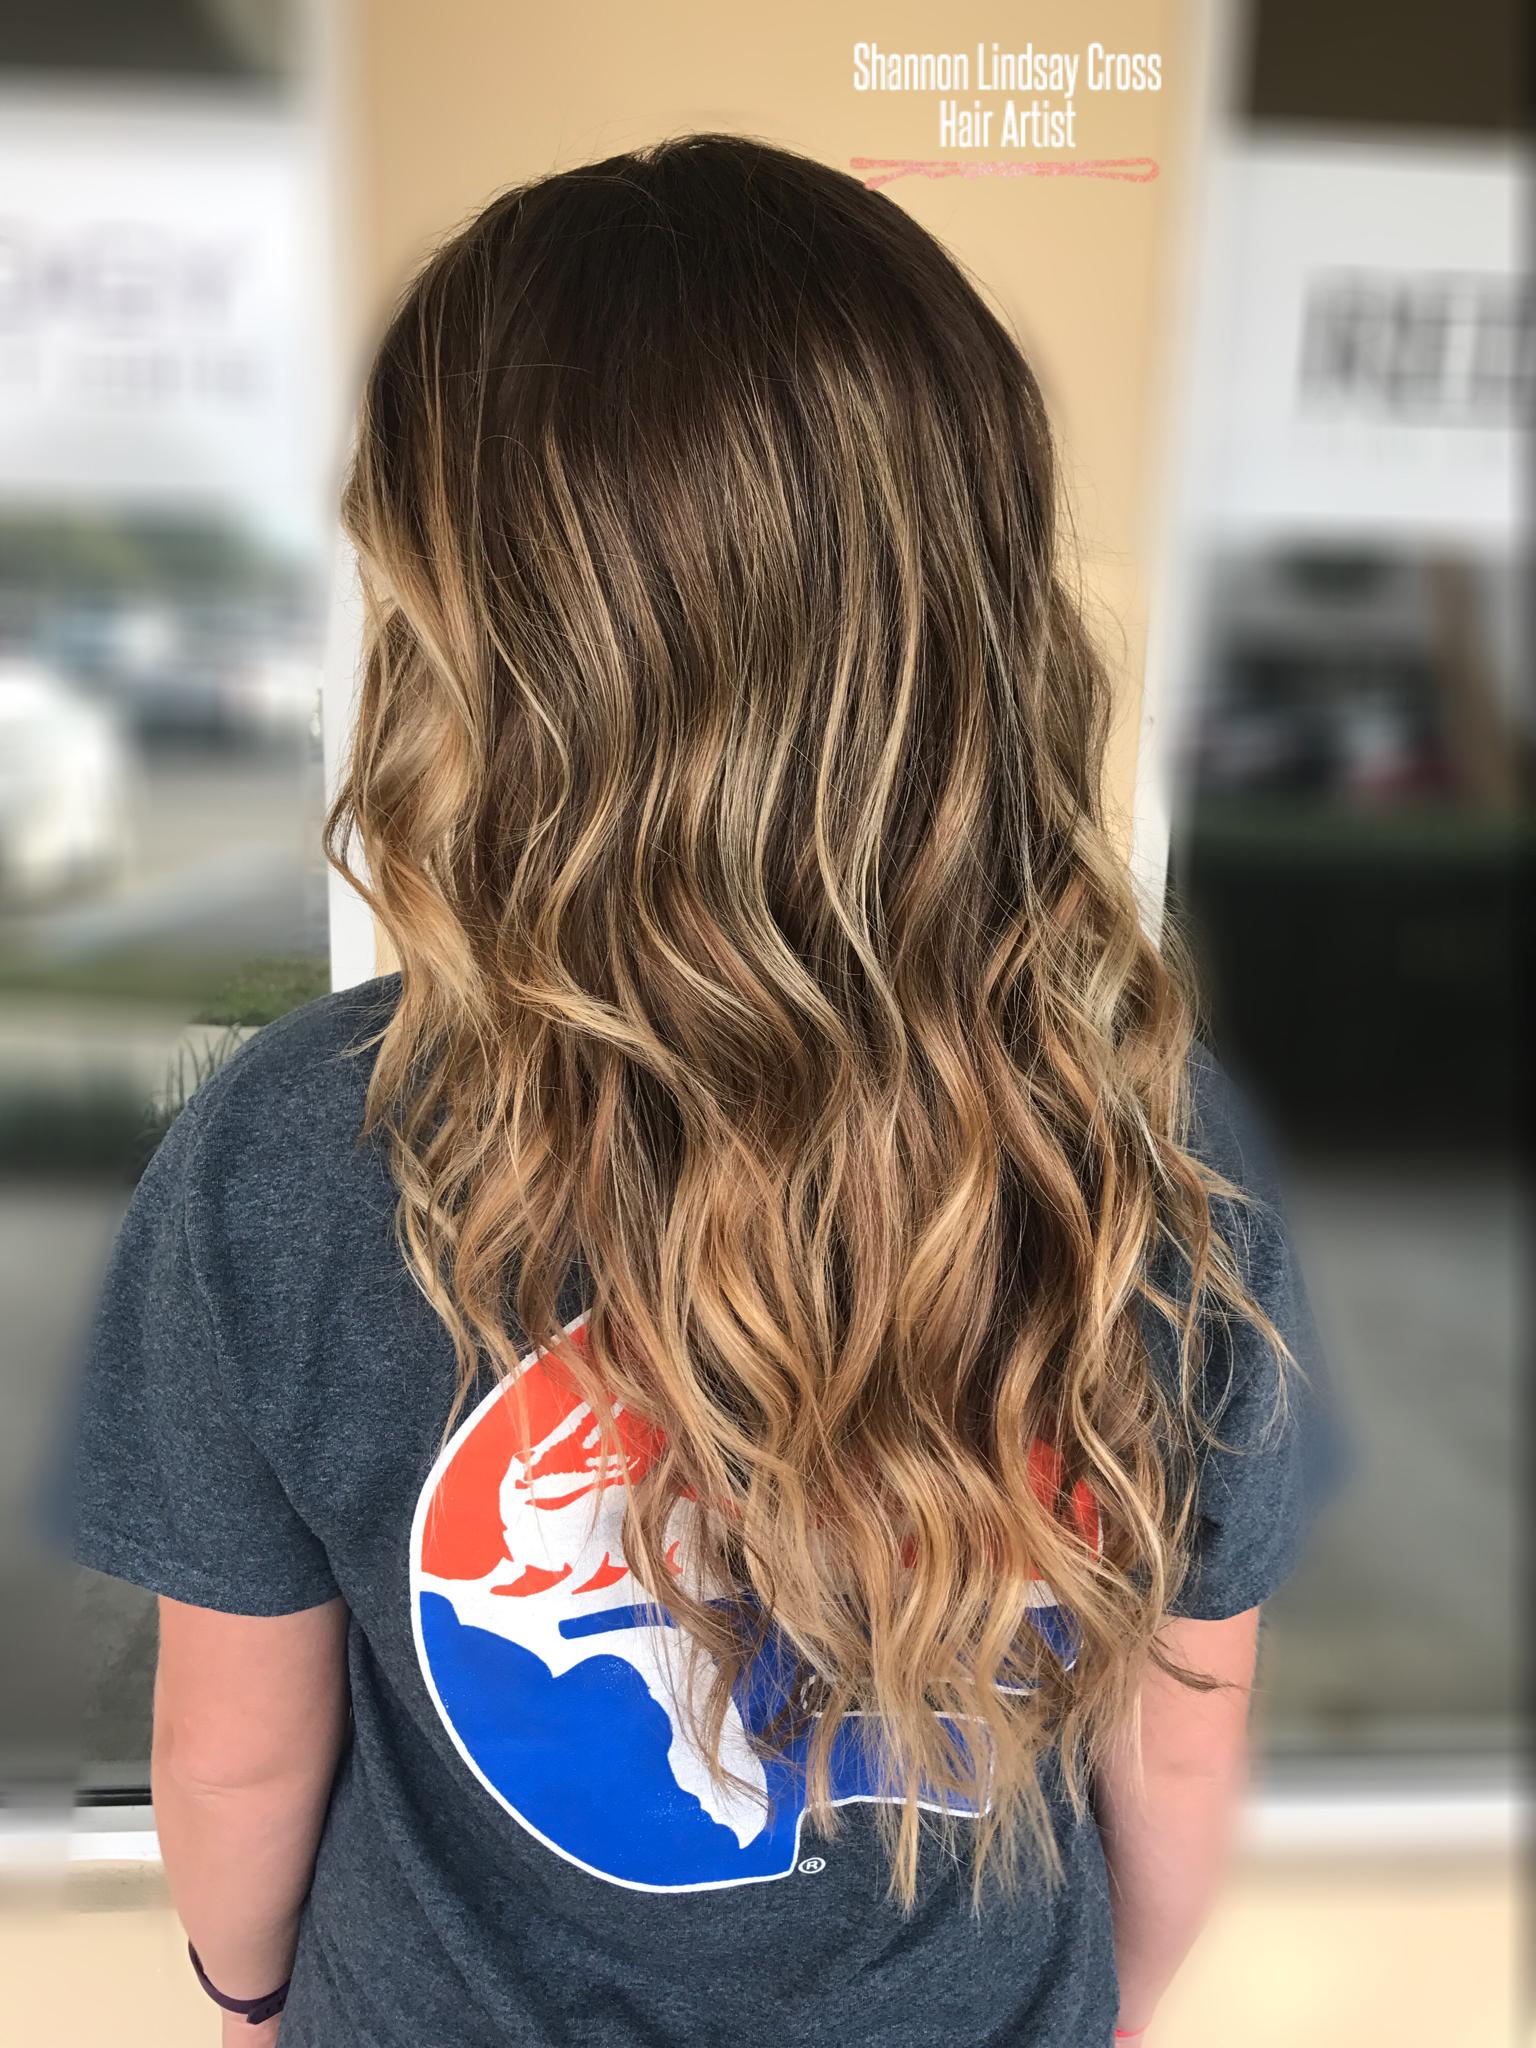 Gainesville Gnv Gainesvillebalayage Gainesvillehair Balayage Saltedcaramel Longhair Salted Caramel Balayage I Artistic Hair Long Hair Styles Hair Styles